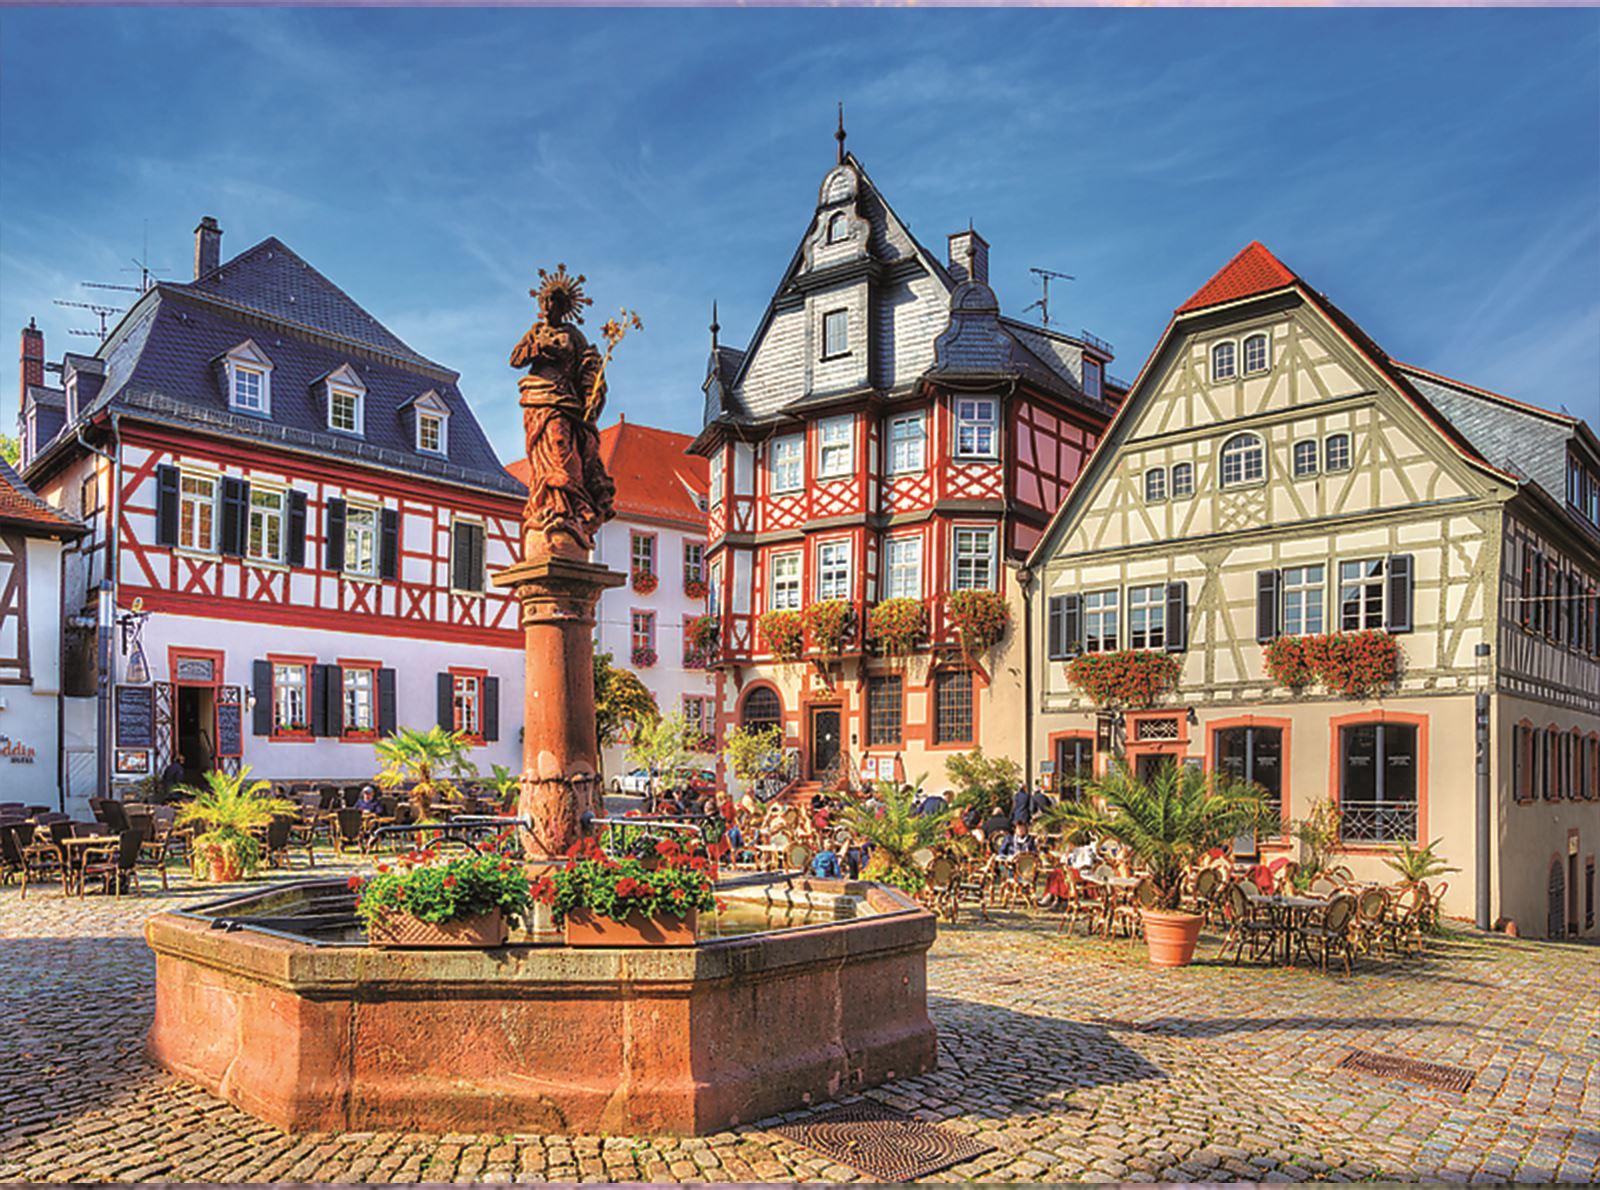 Trefl-300-500-1000-1500-2000-3000-4000-6000-Piece-Jigsaw-Puzzle-Landscapes-City thumbnail 217